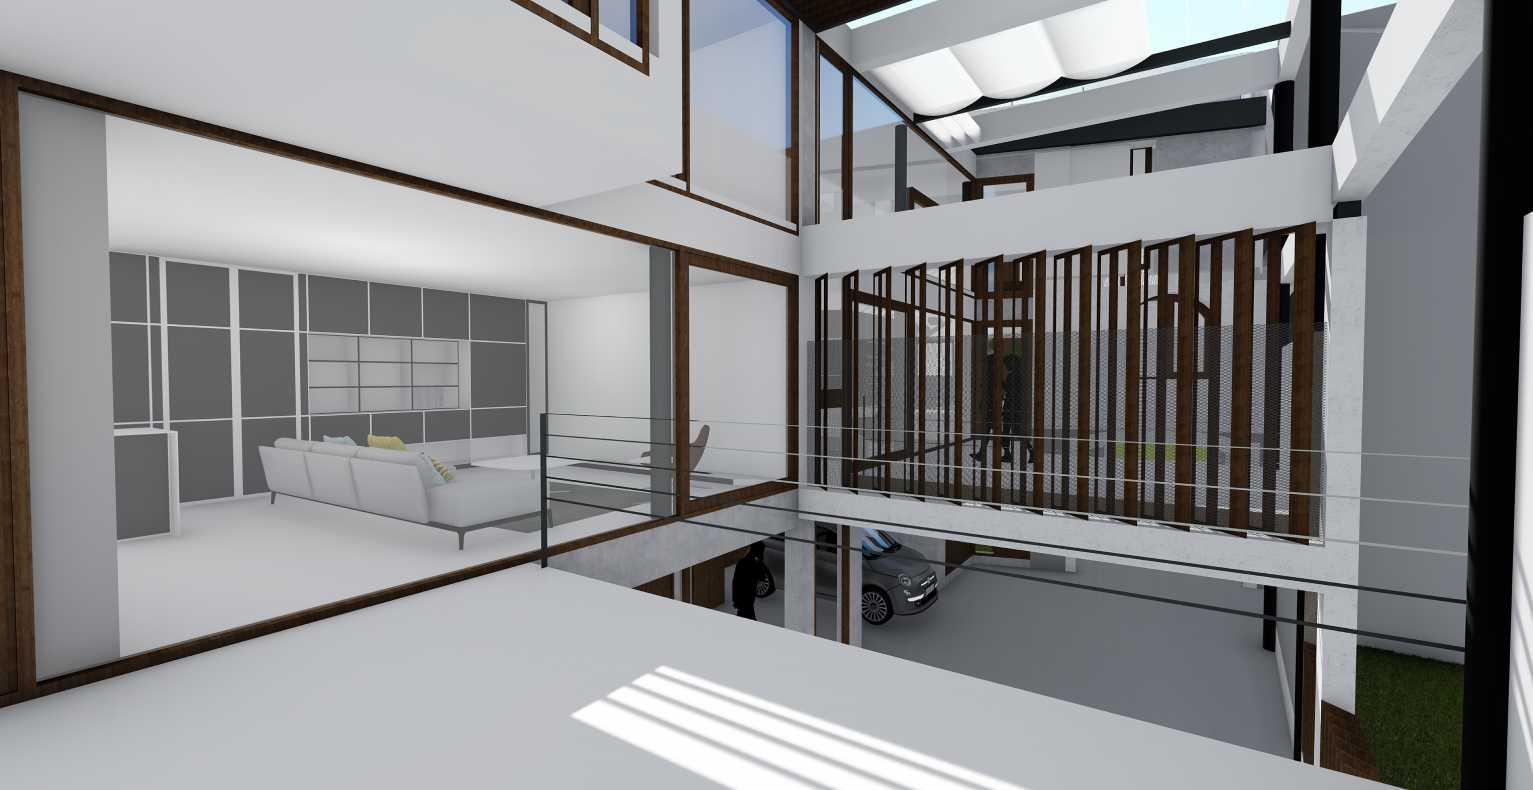 PLOR Invest - Prodaja stanova u centru Varaždina